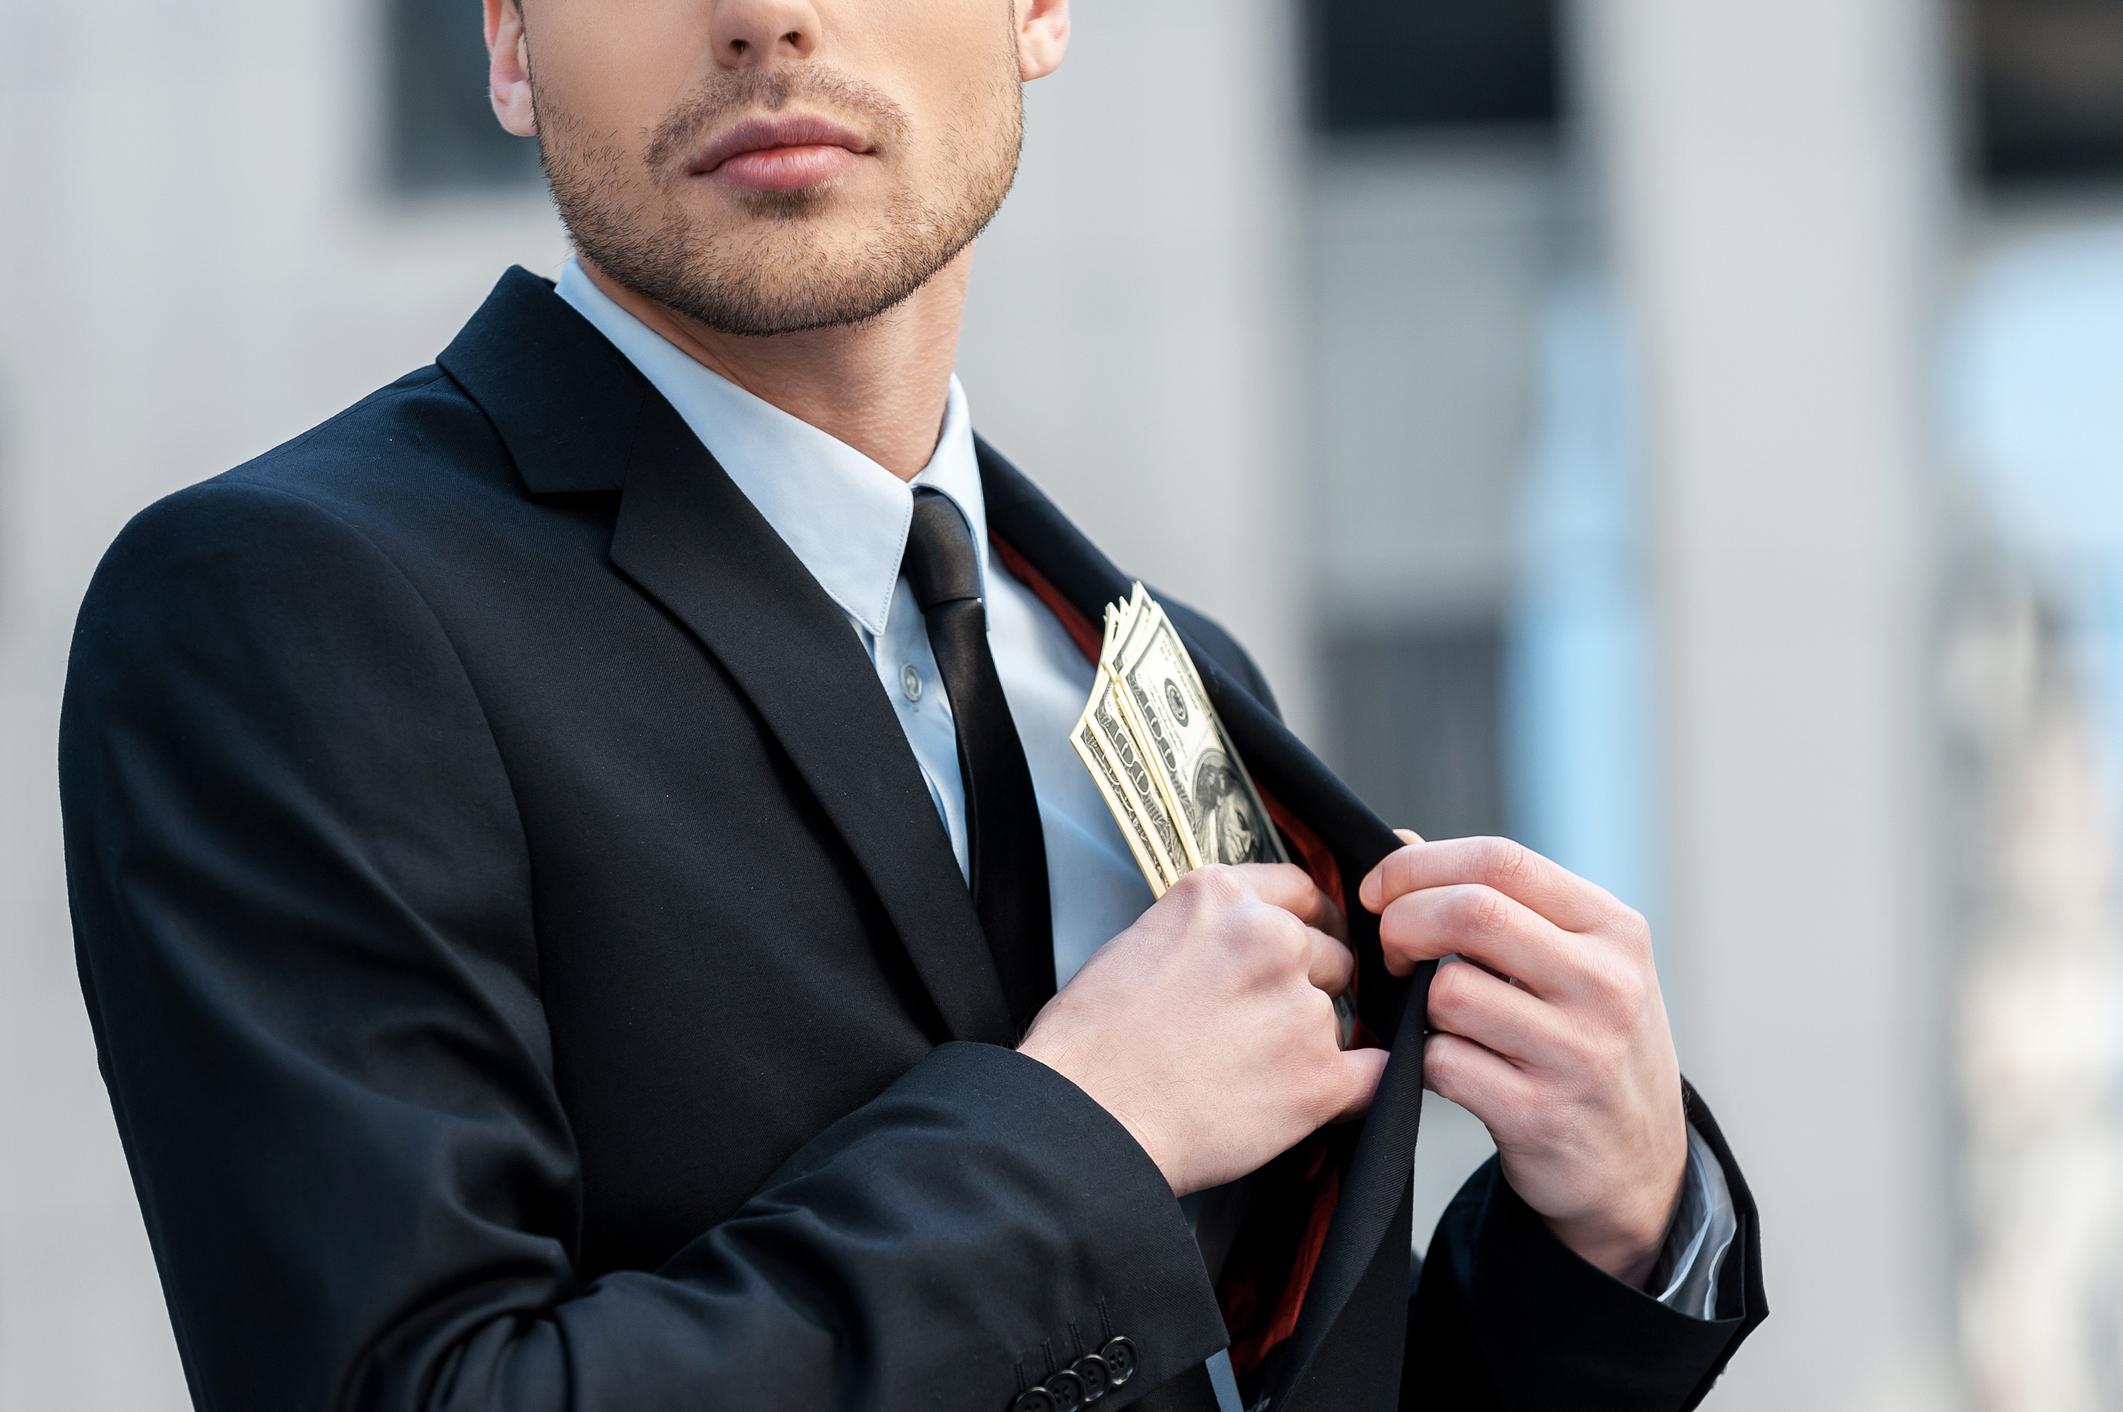 Man in suit stashing cash in coat pocket.